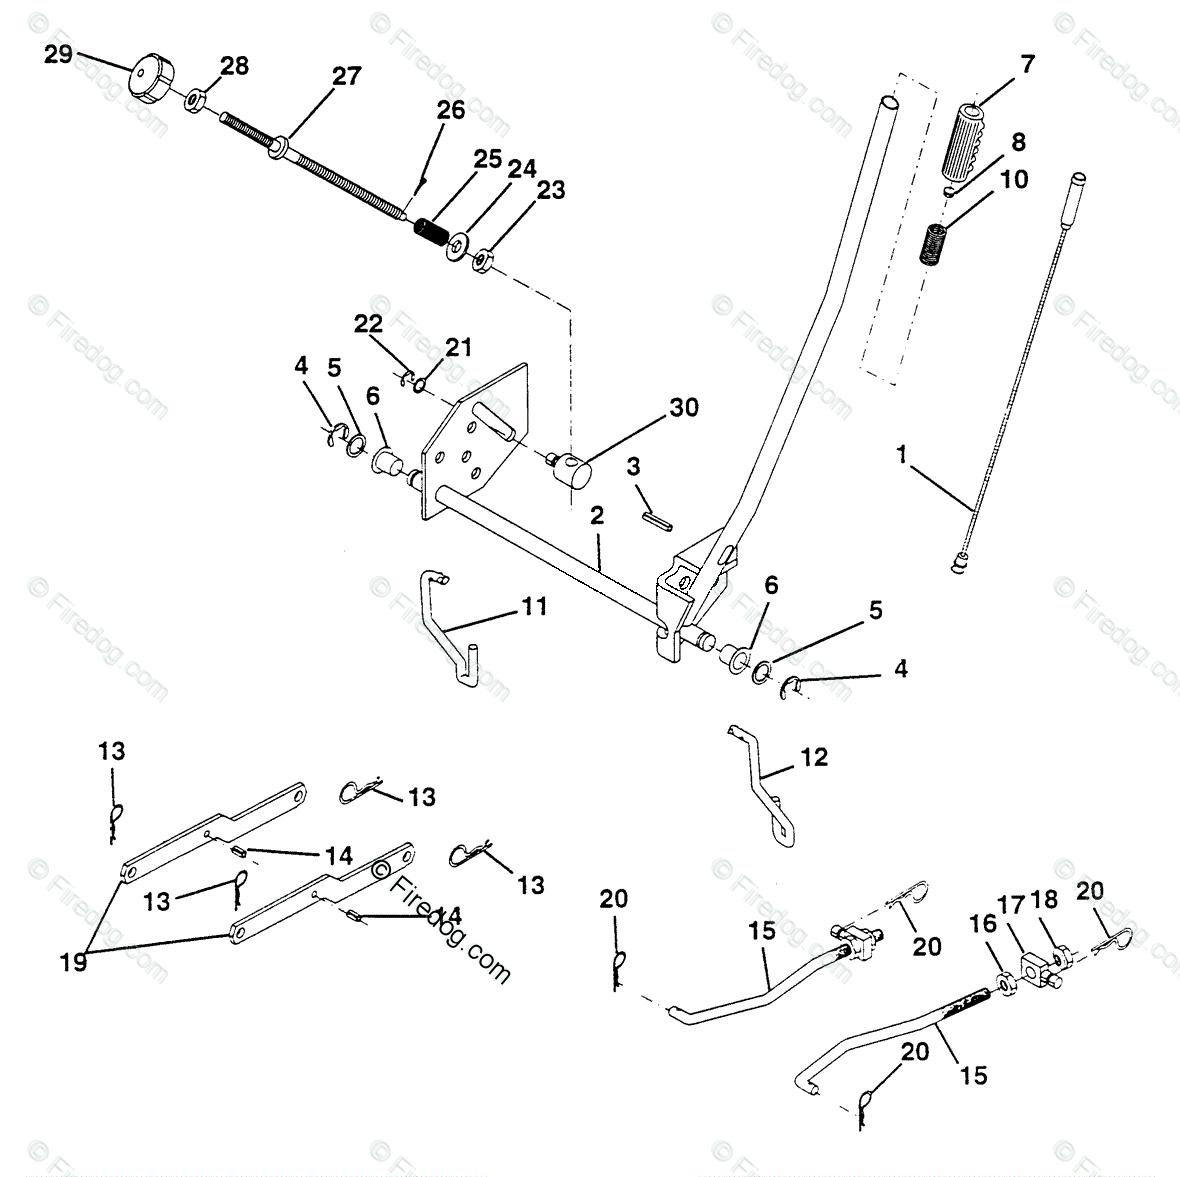 1993 Husqvarna Wiring Diagram Schematic Diagrams Ride Mower Lt 140 Hu4h42a 954000512 01 Oem Outside Light